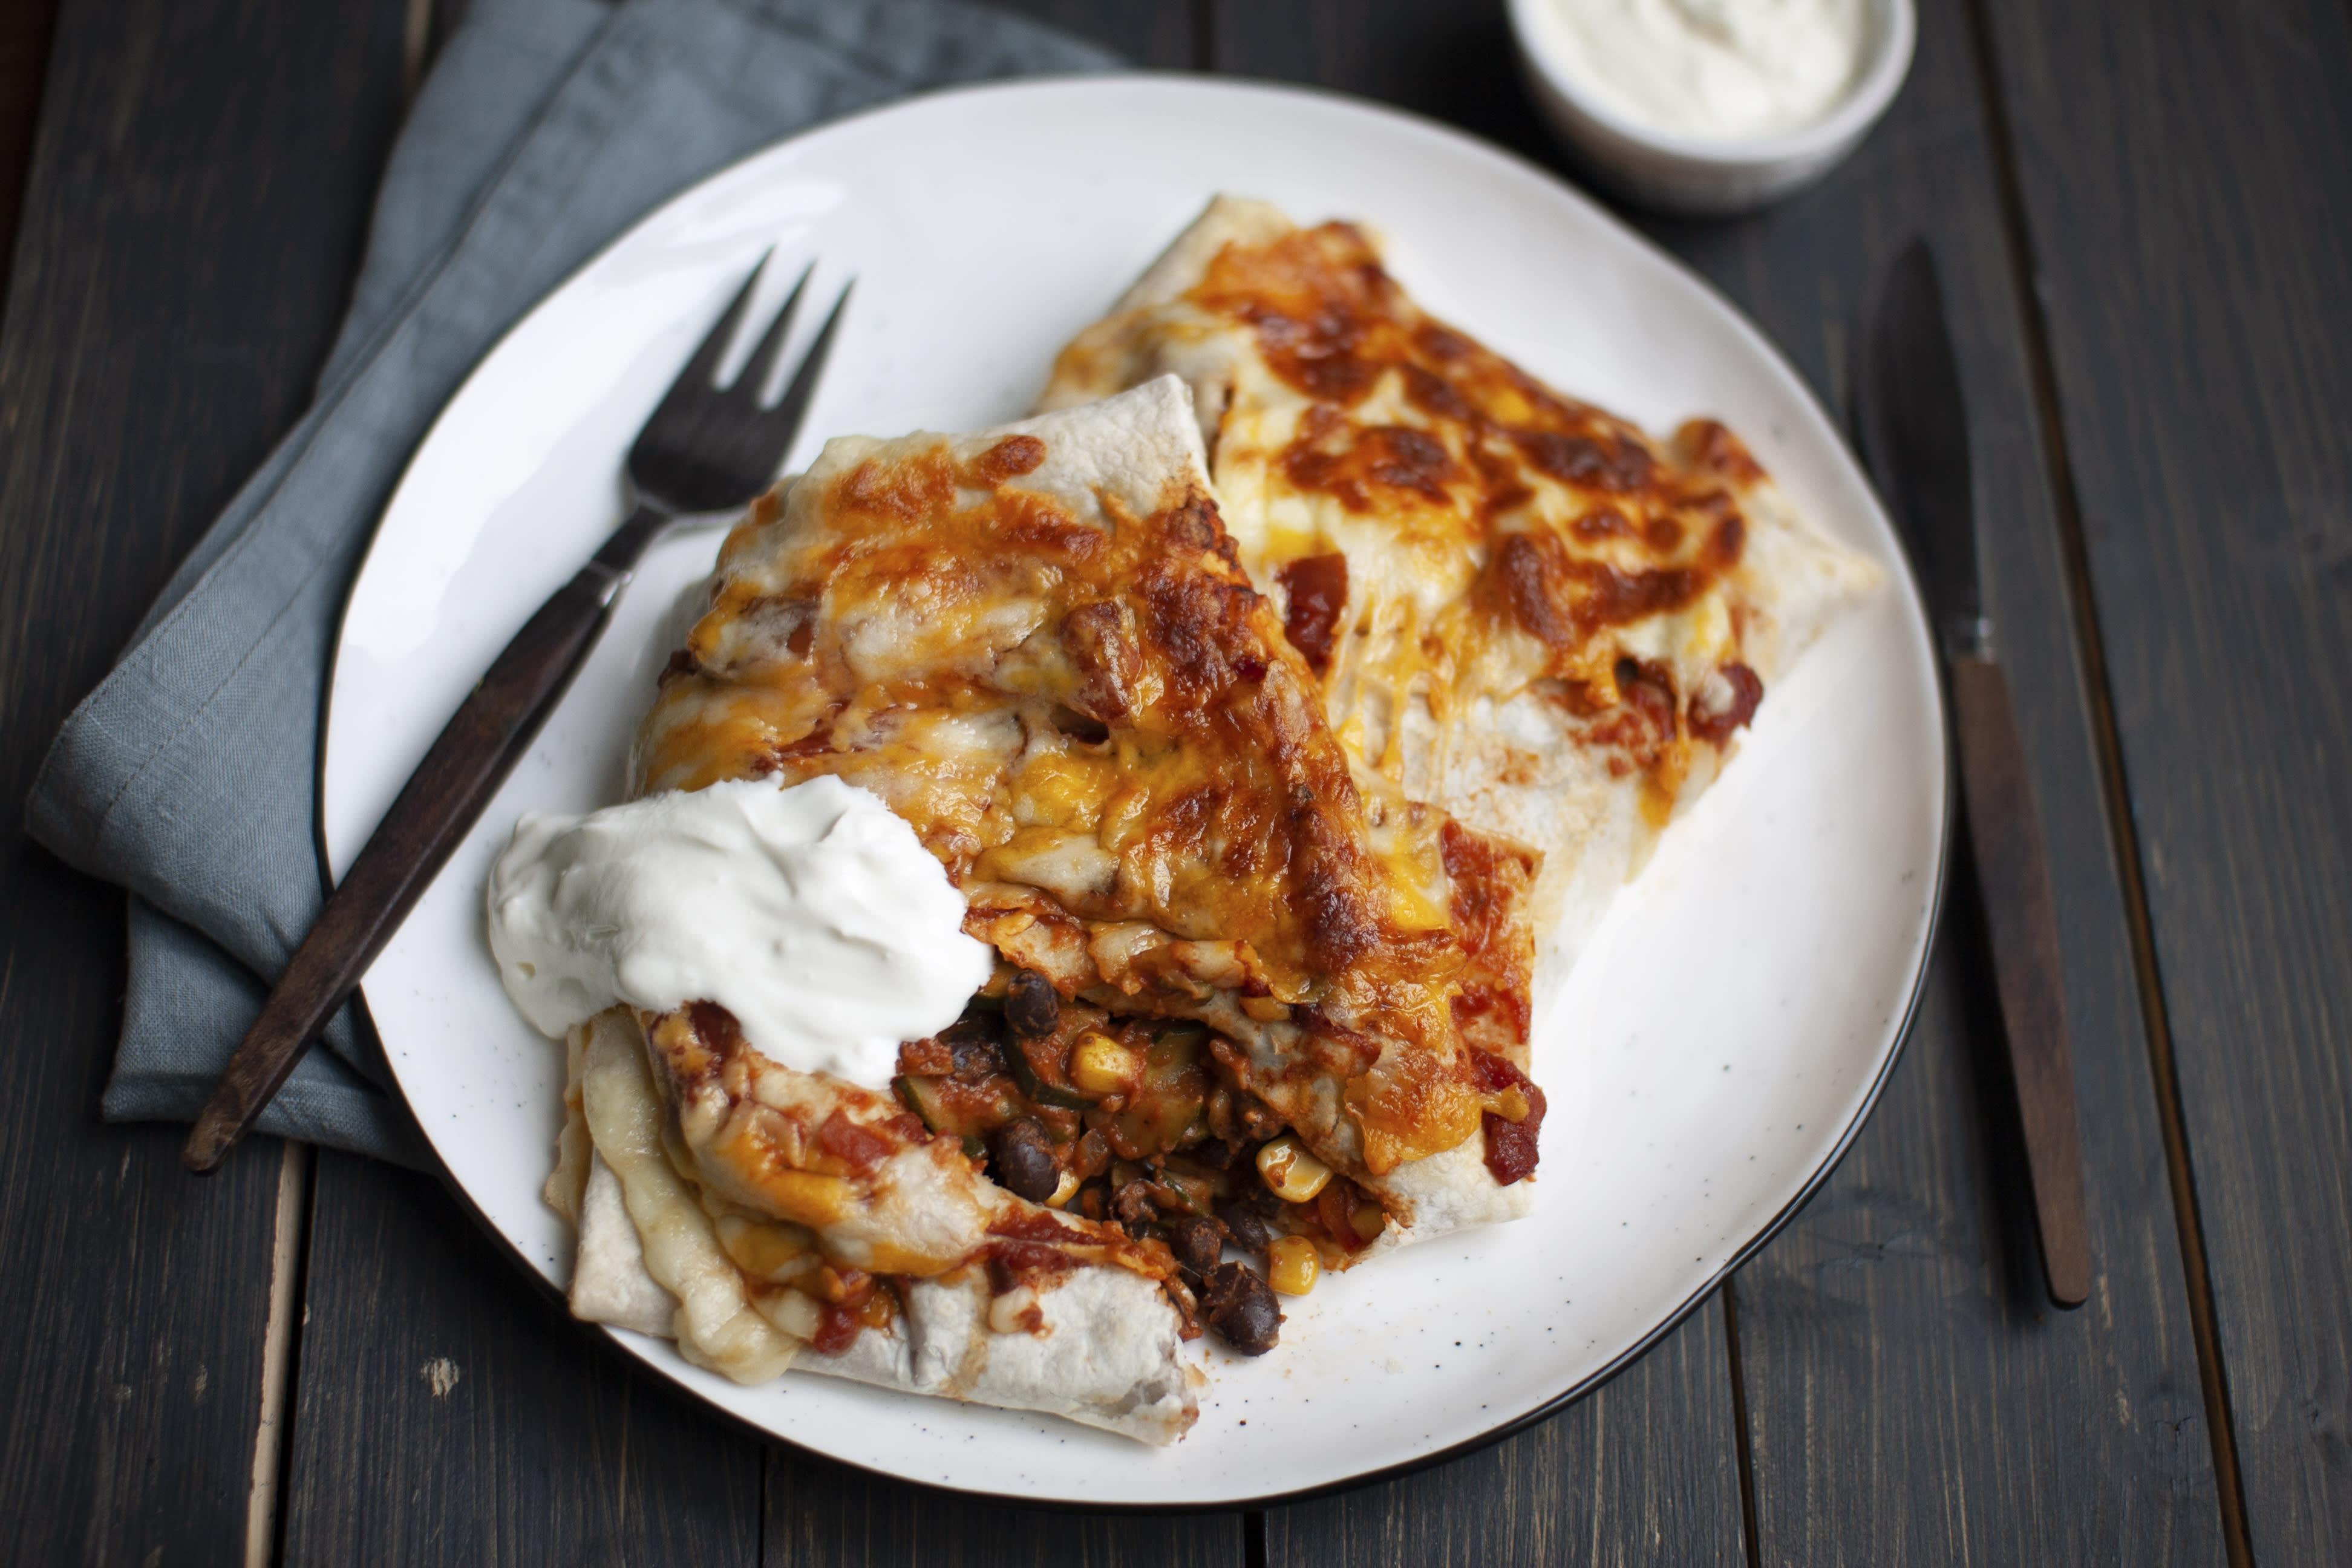 Black Bean and Corn Veggie Enchiladas with Sour Cream